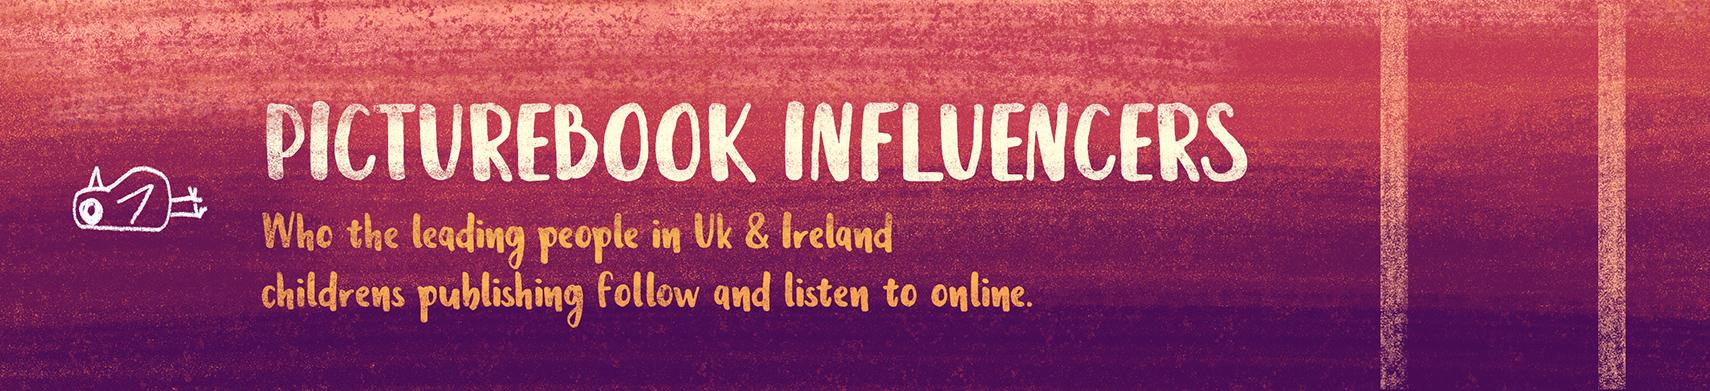 picturebook-influencers-uk-ireland-book-1710px